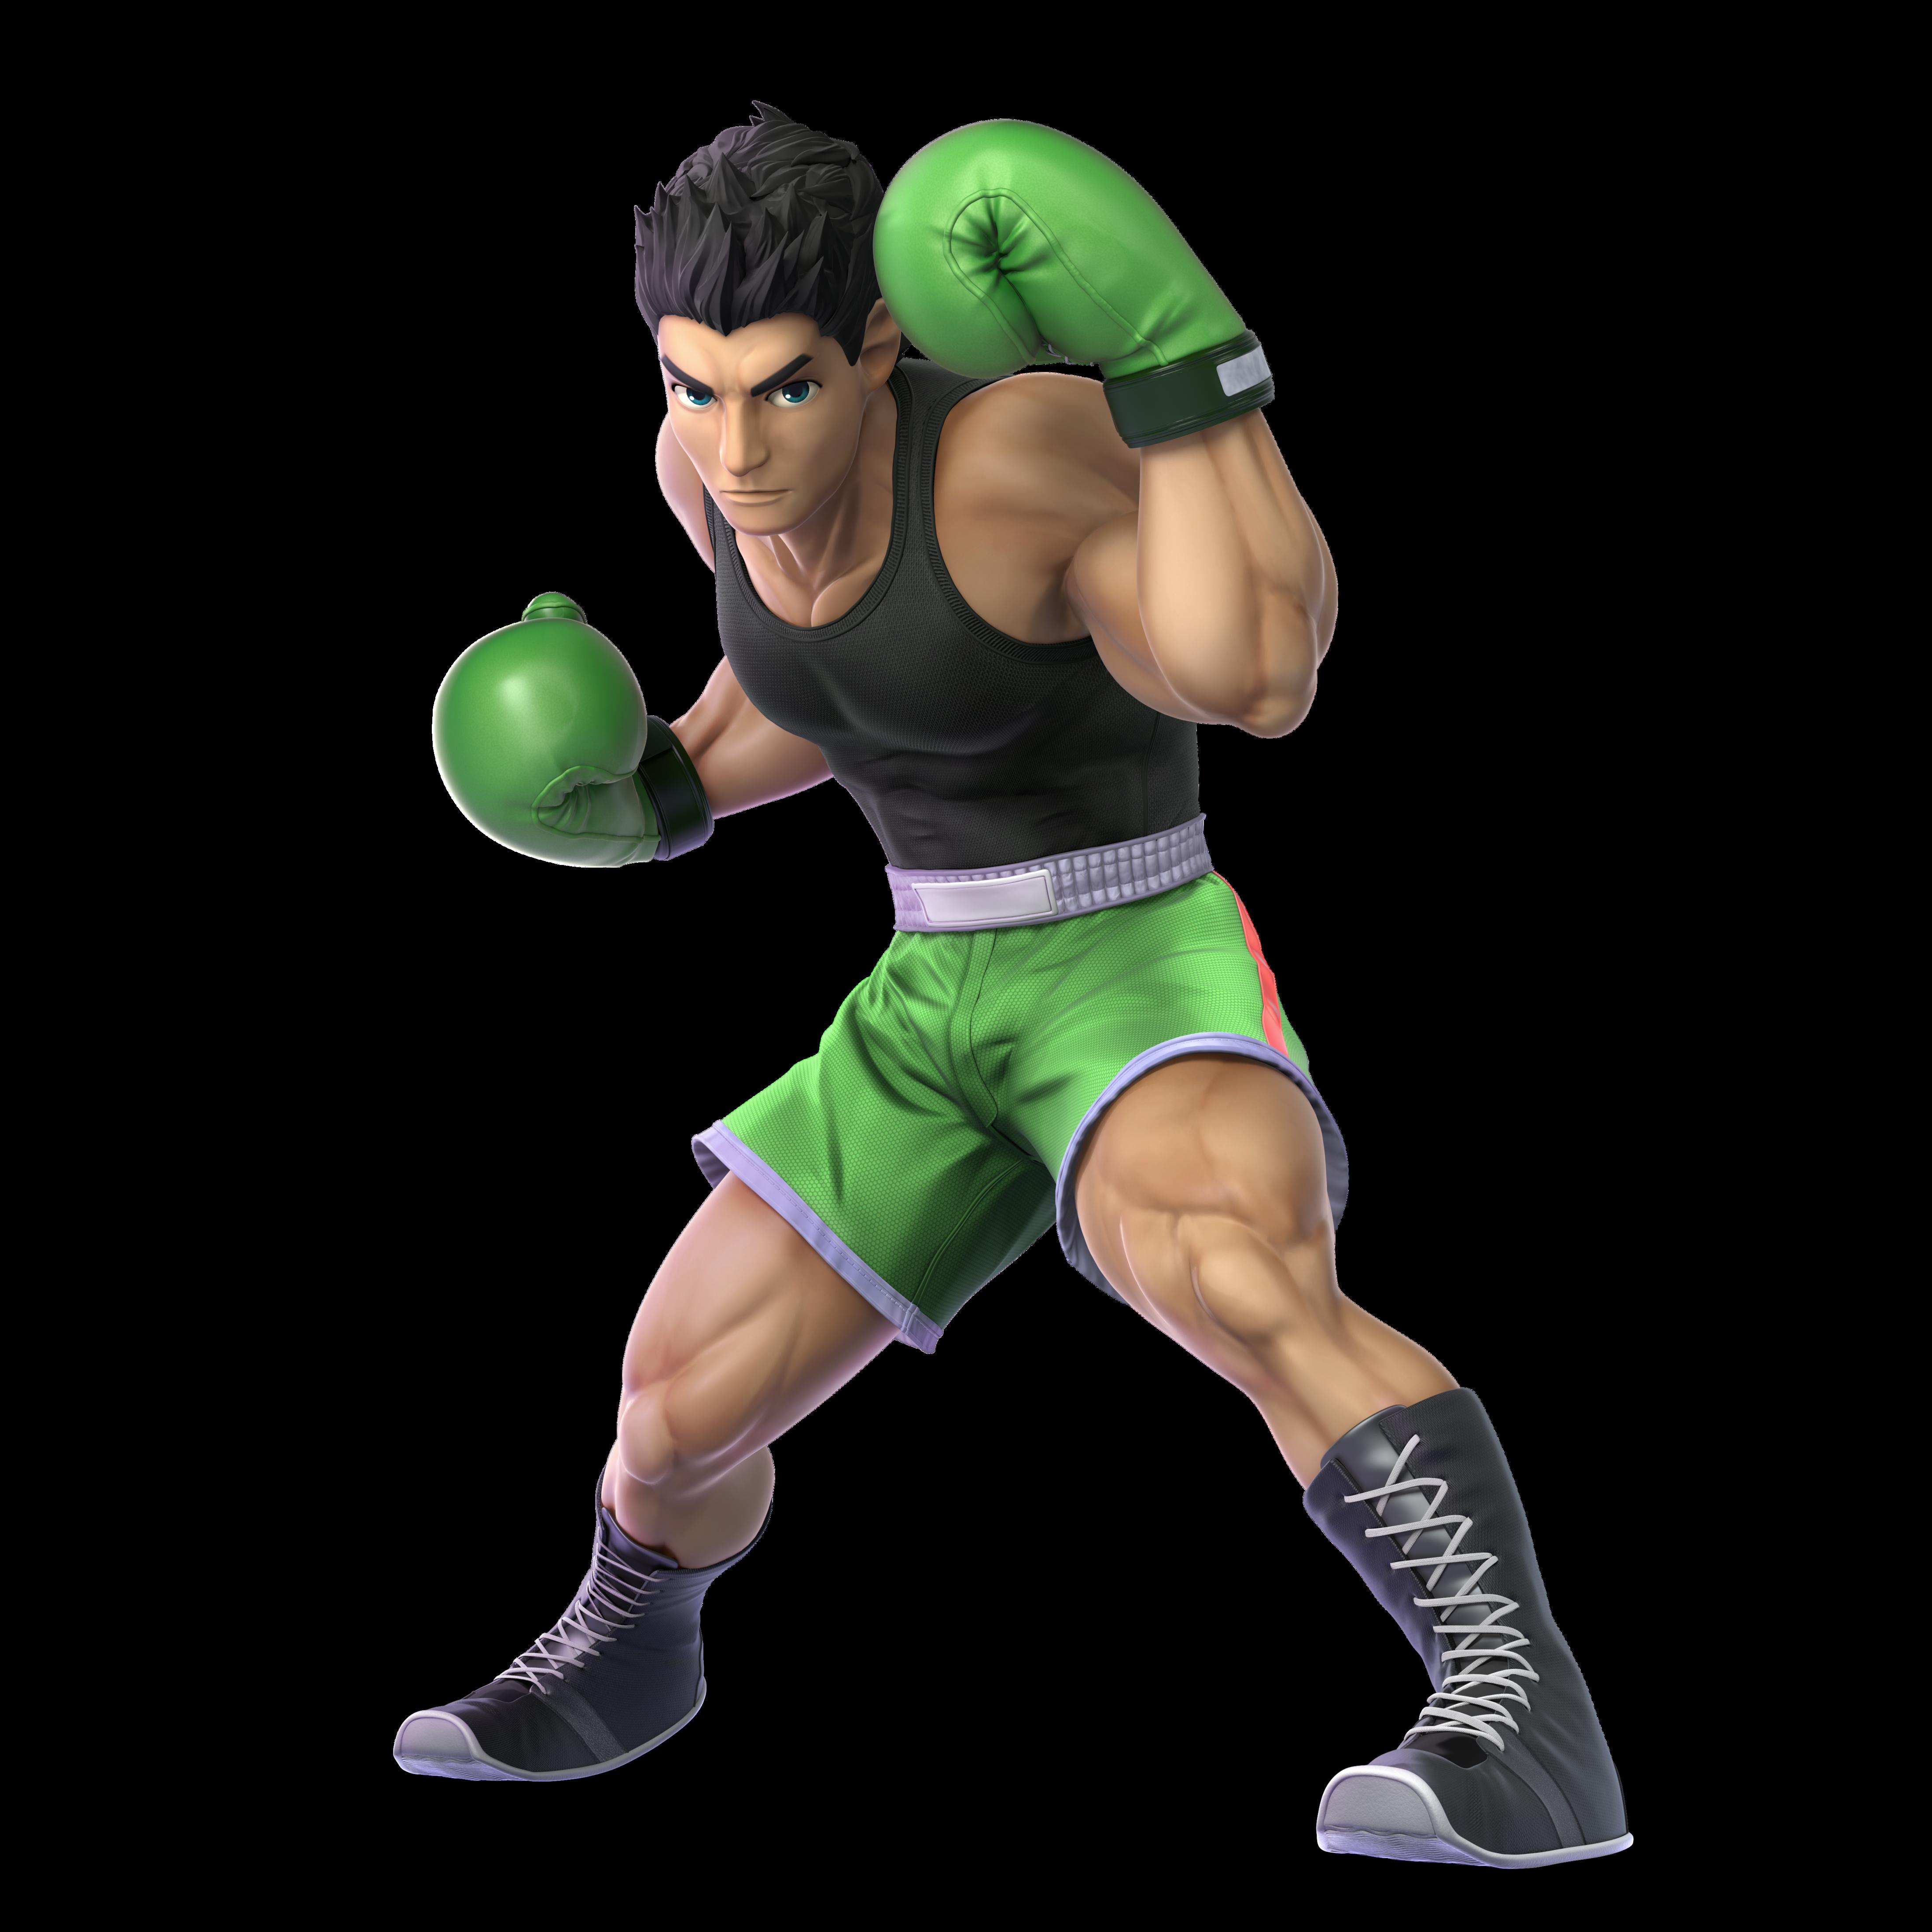 Super High-Resolution Artwork For Super Smash Bros